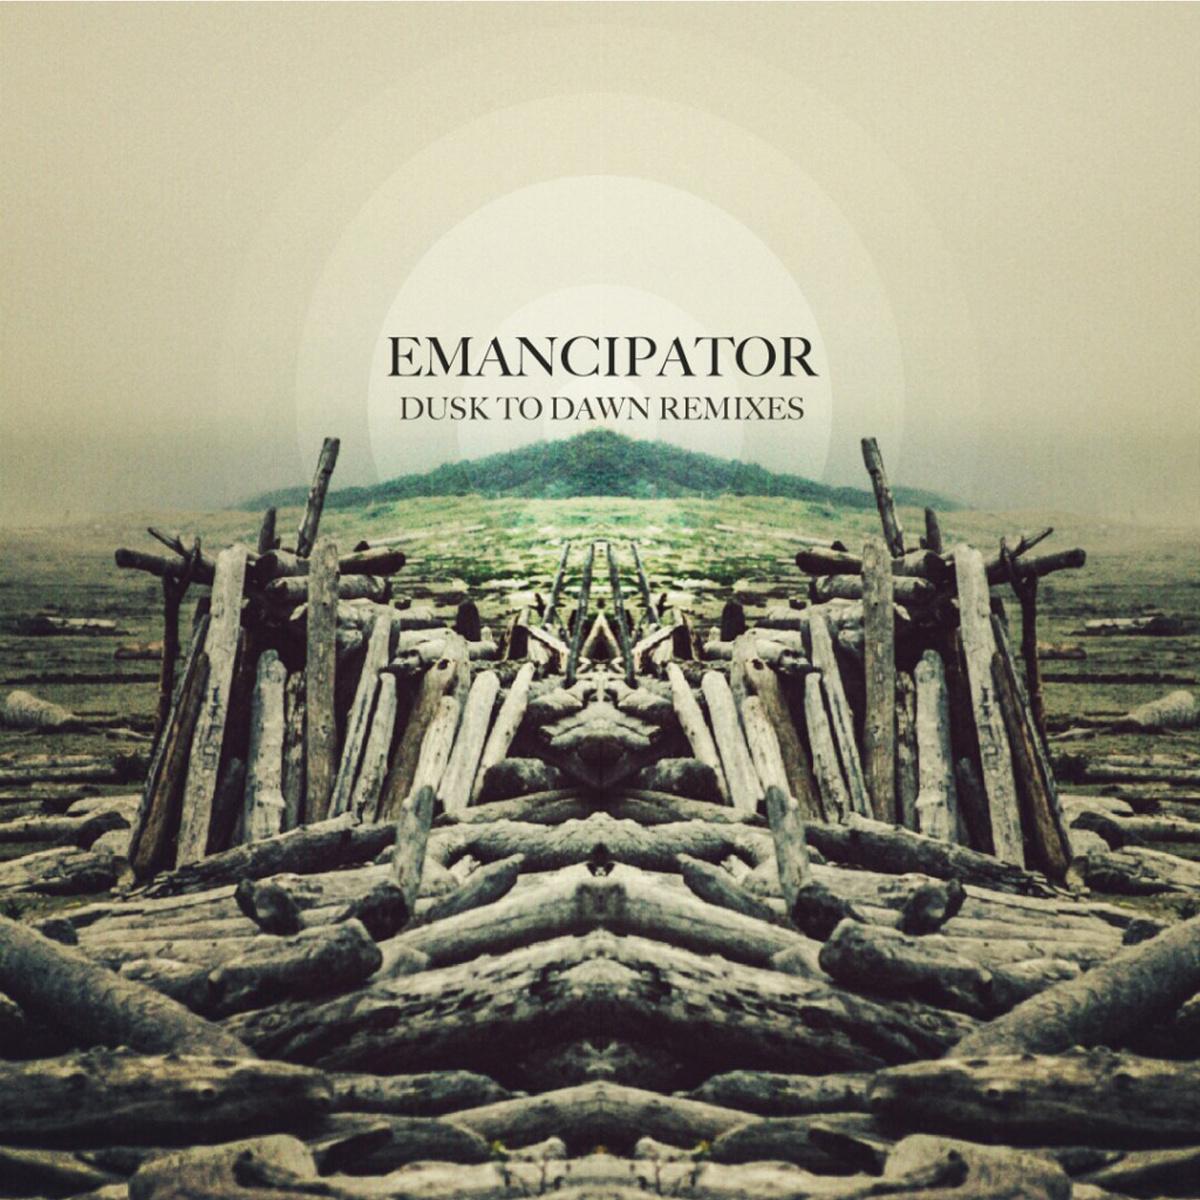 Emancipator. Dusk to Dawn Remixes.